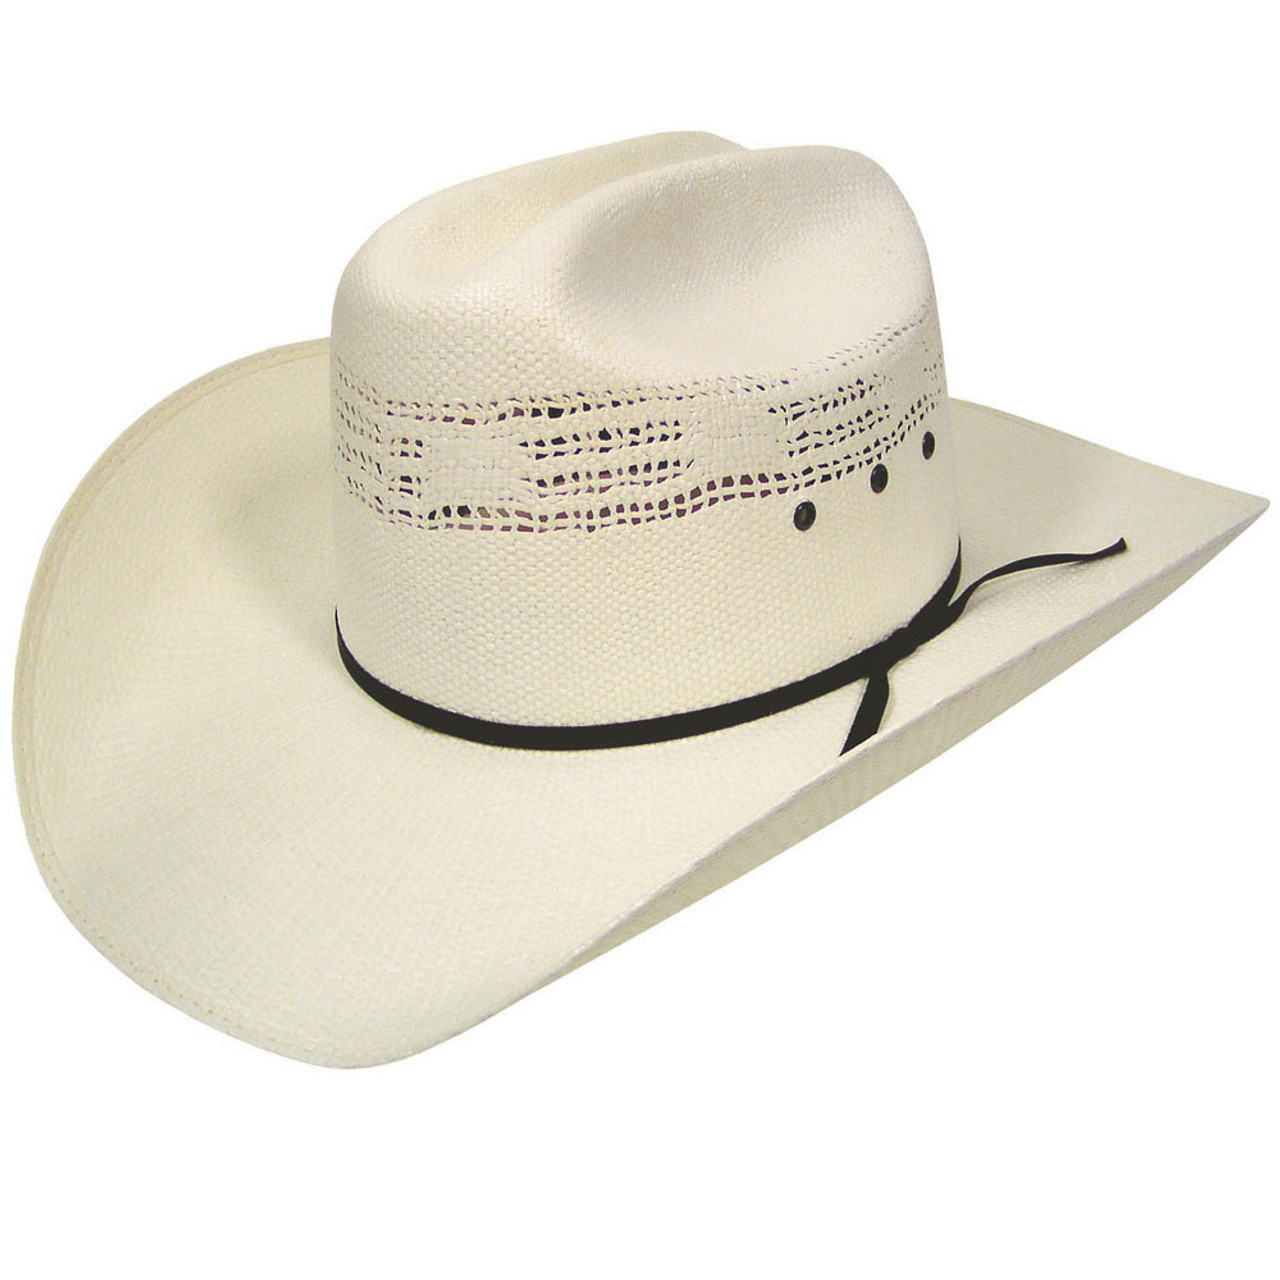 96f387335a9 Wrangler Western Jhonson Bangora Hat - Koolstuff Australia